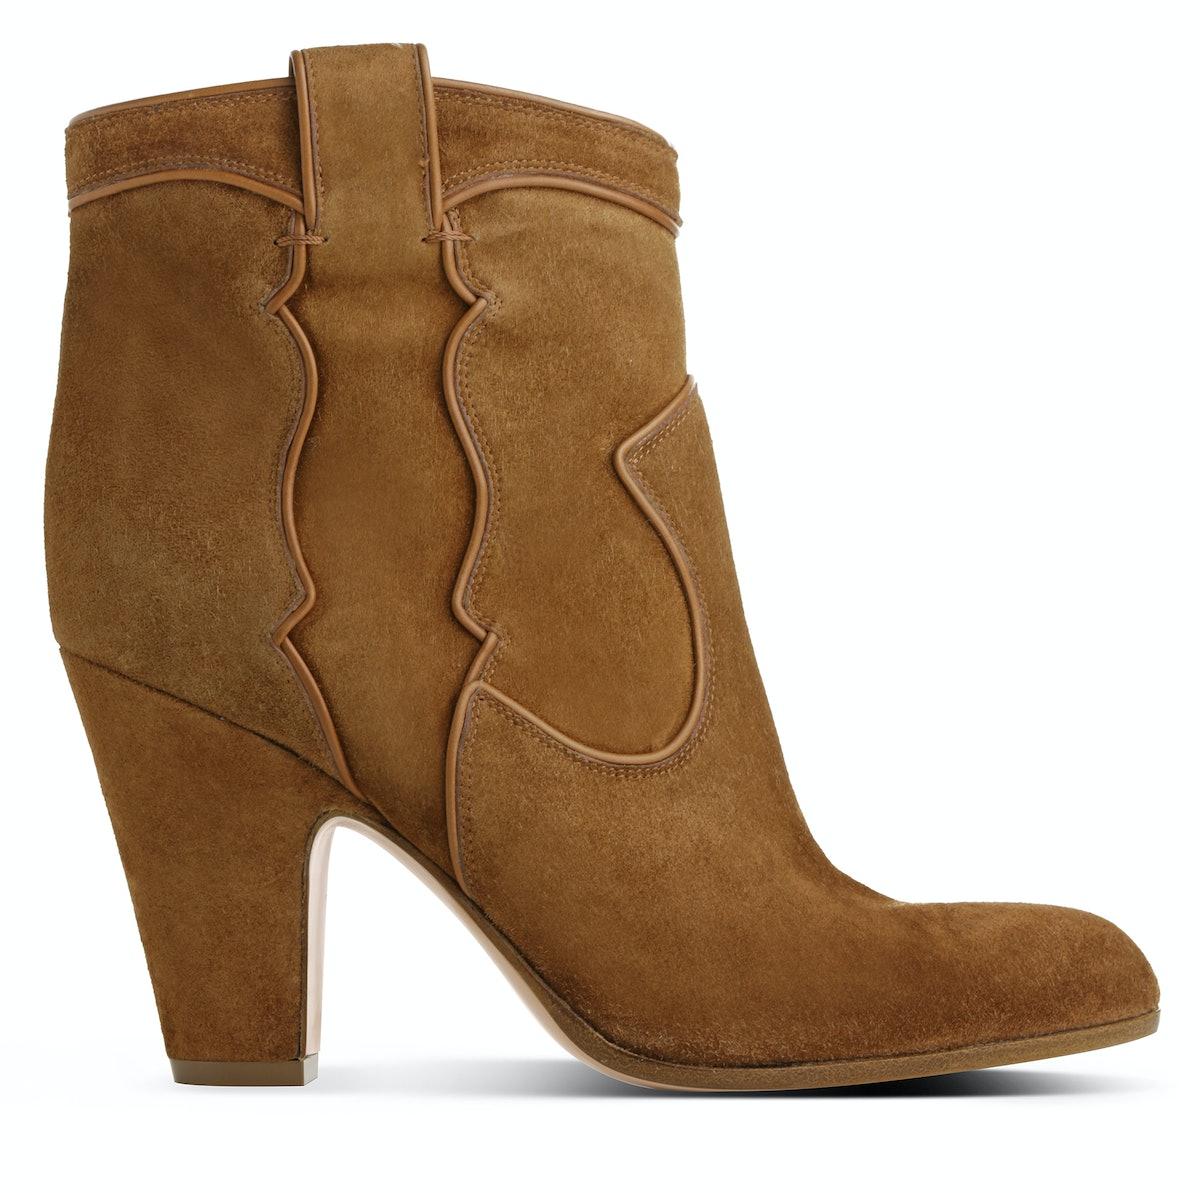 Gianvitto Rossi boots